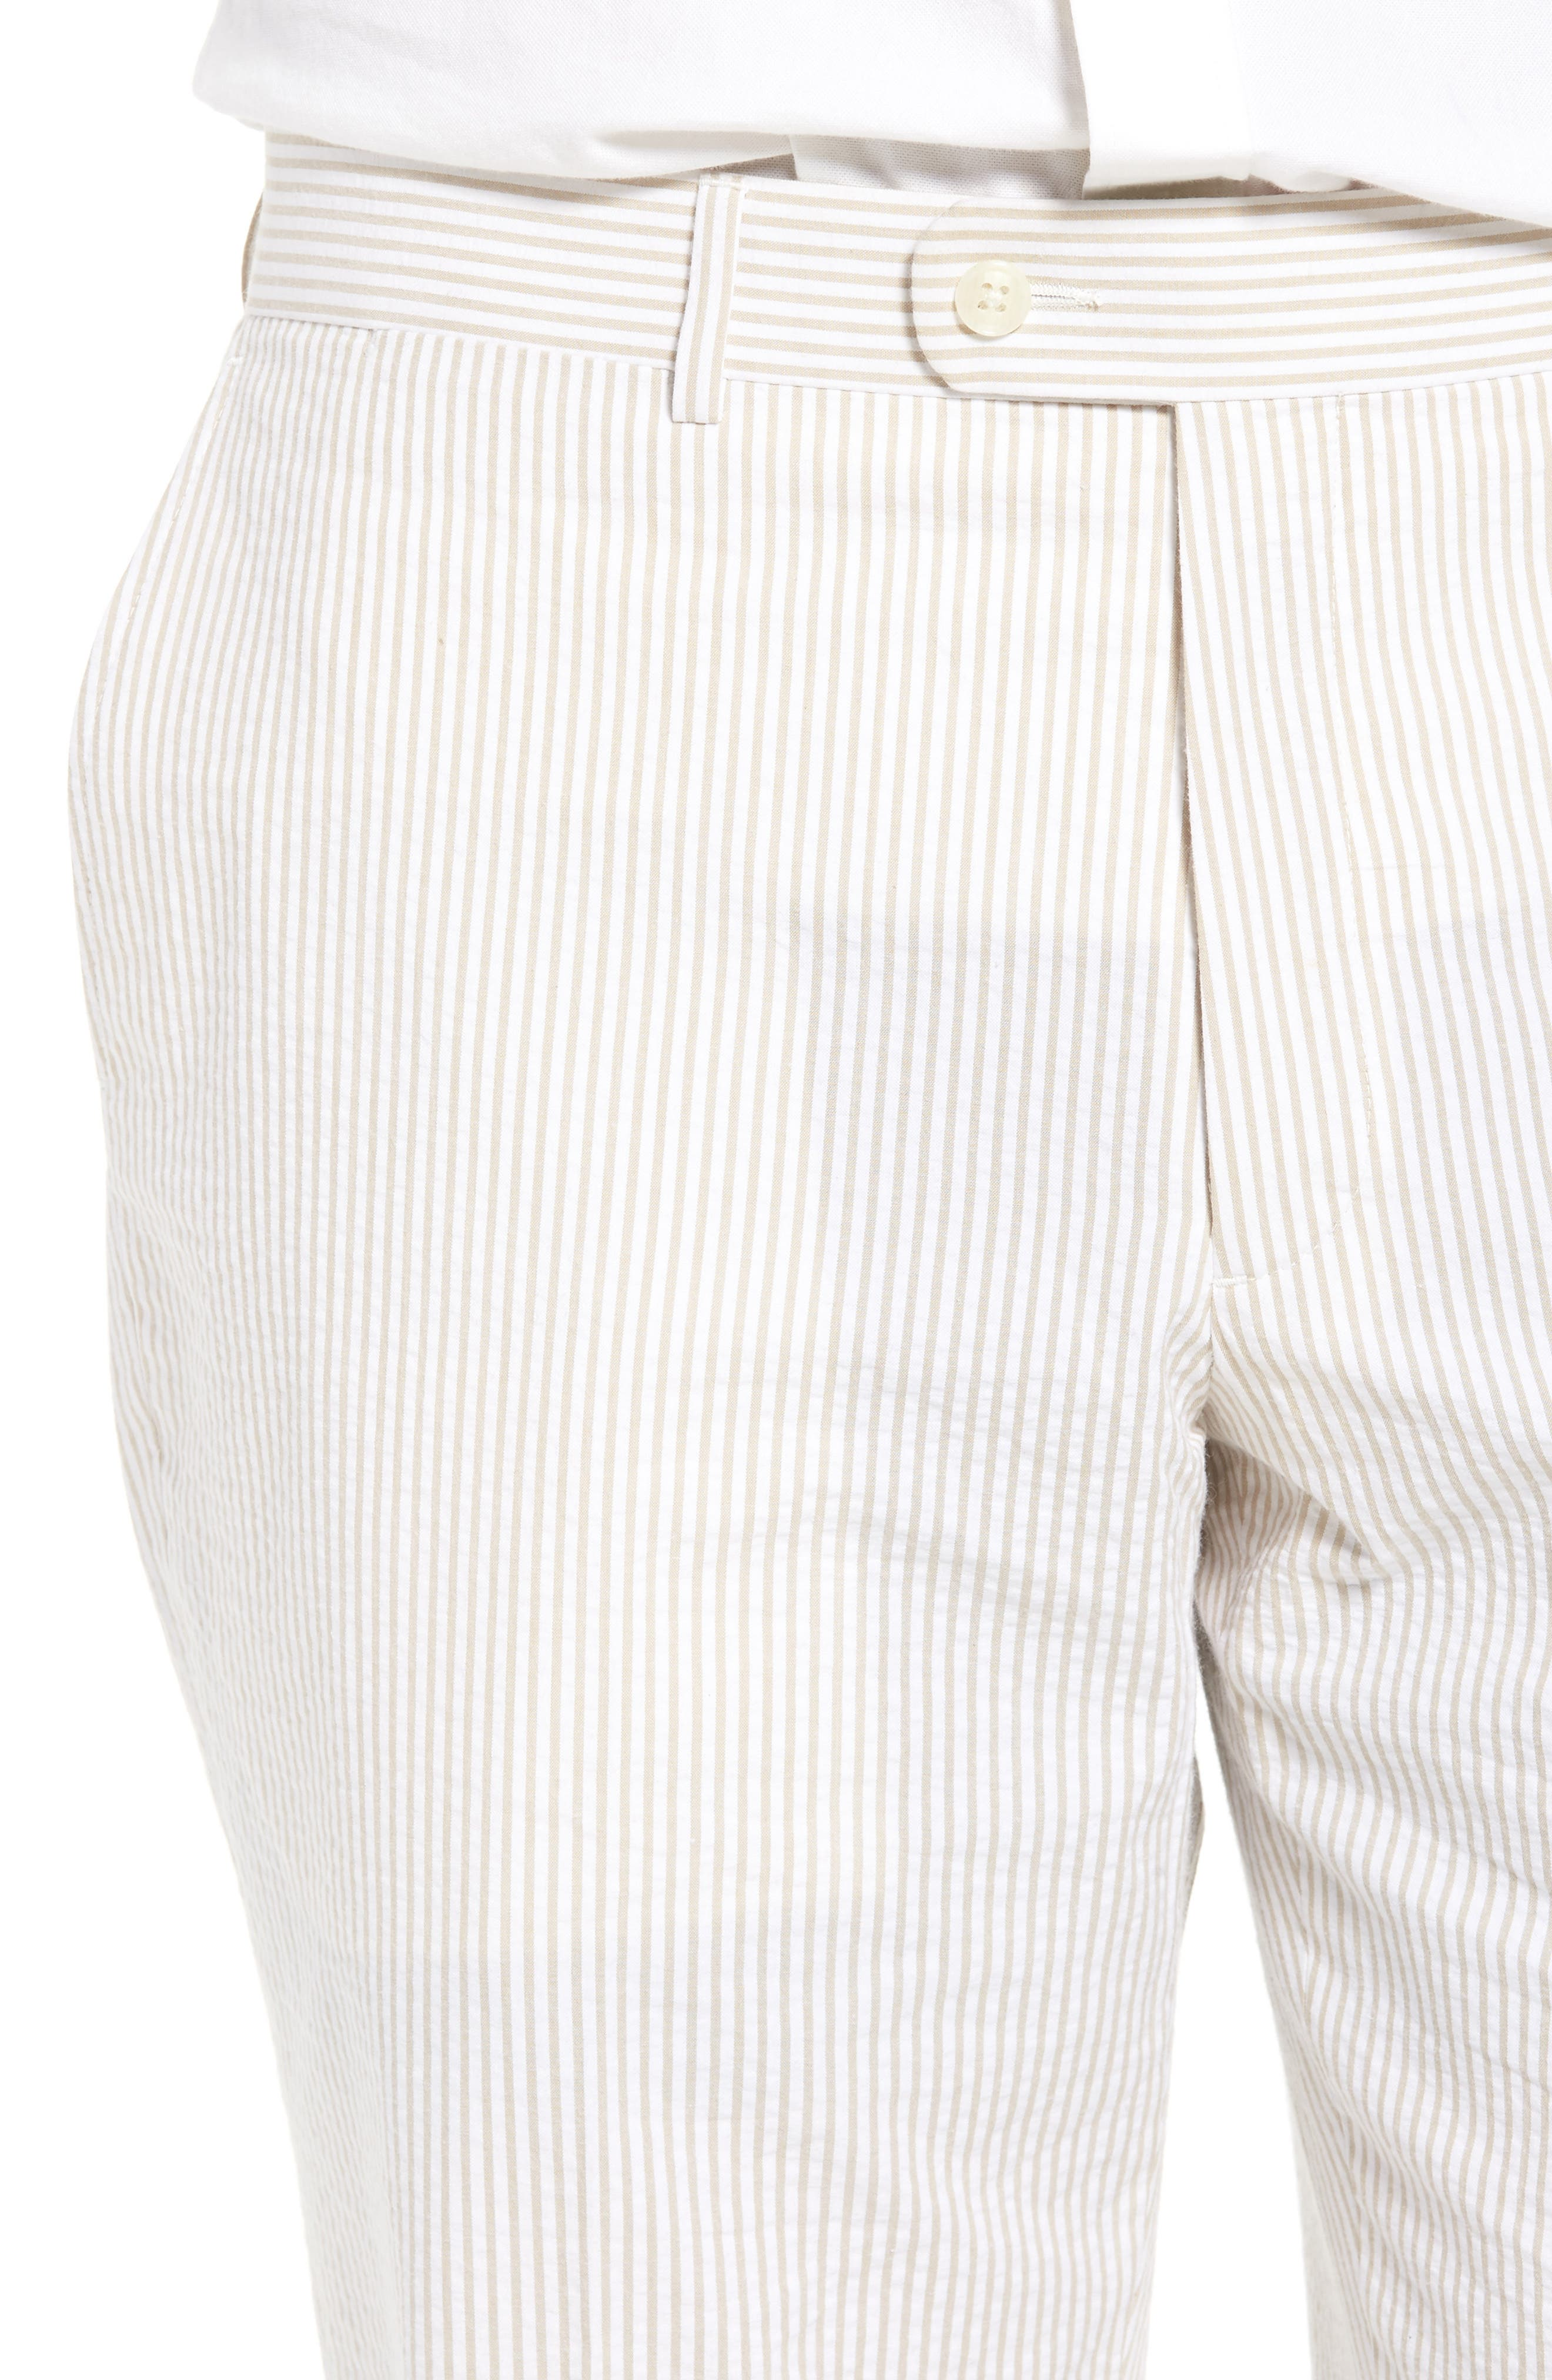 Andrew AIM Flat Front Seersucker Trousers,                             Alternate thumbnail 4, color,                             250